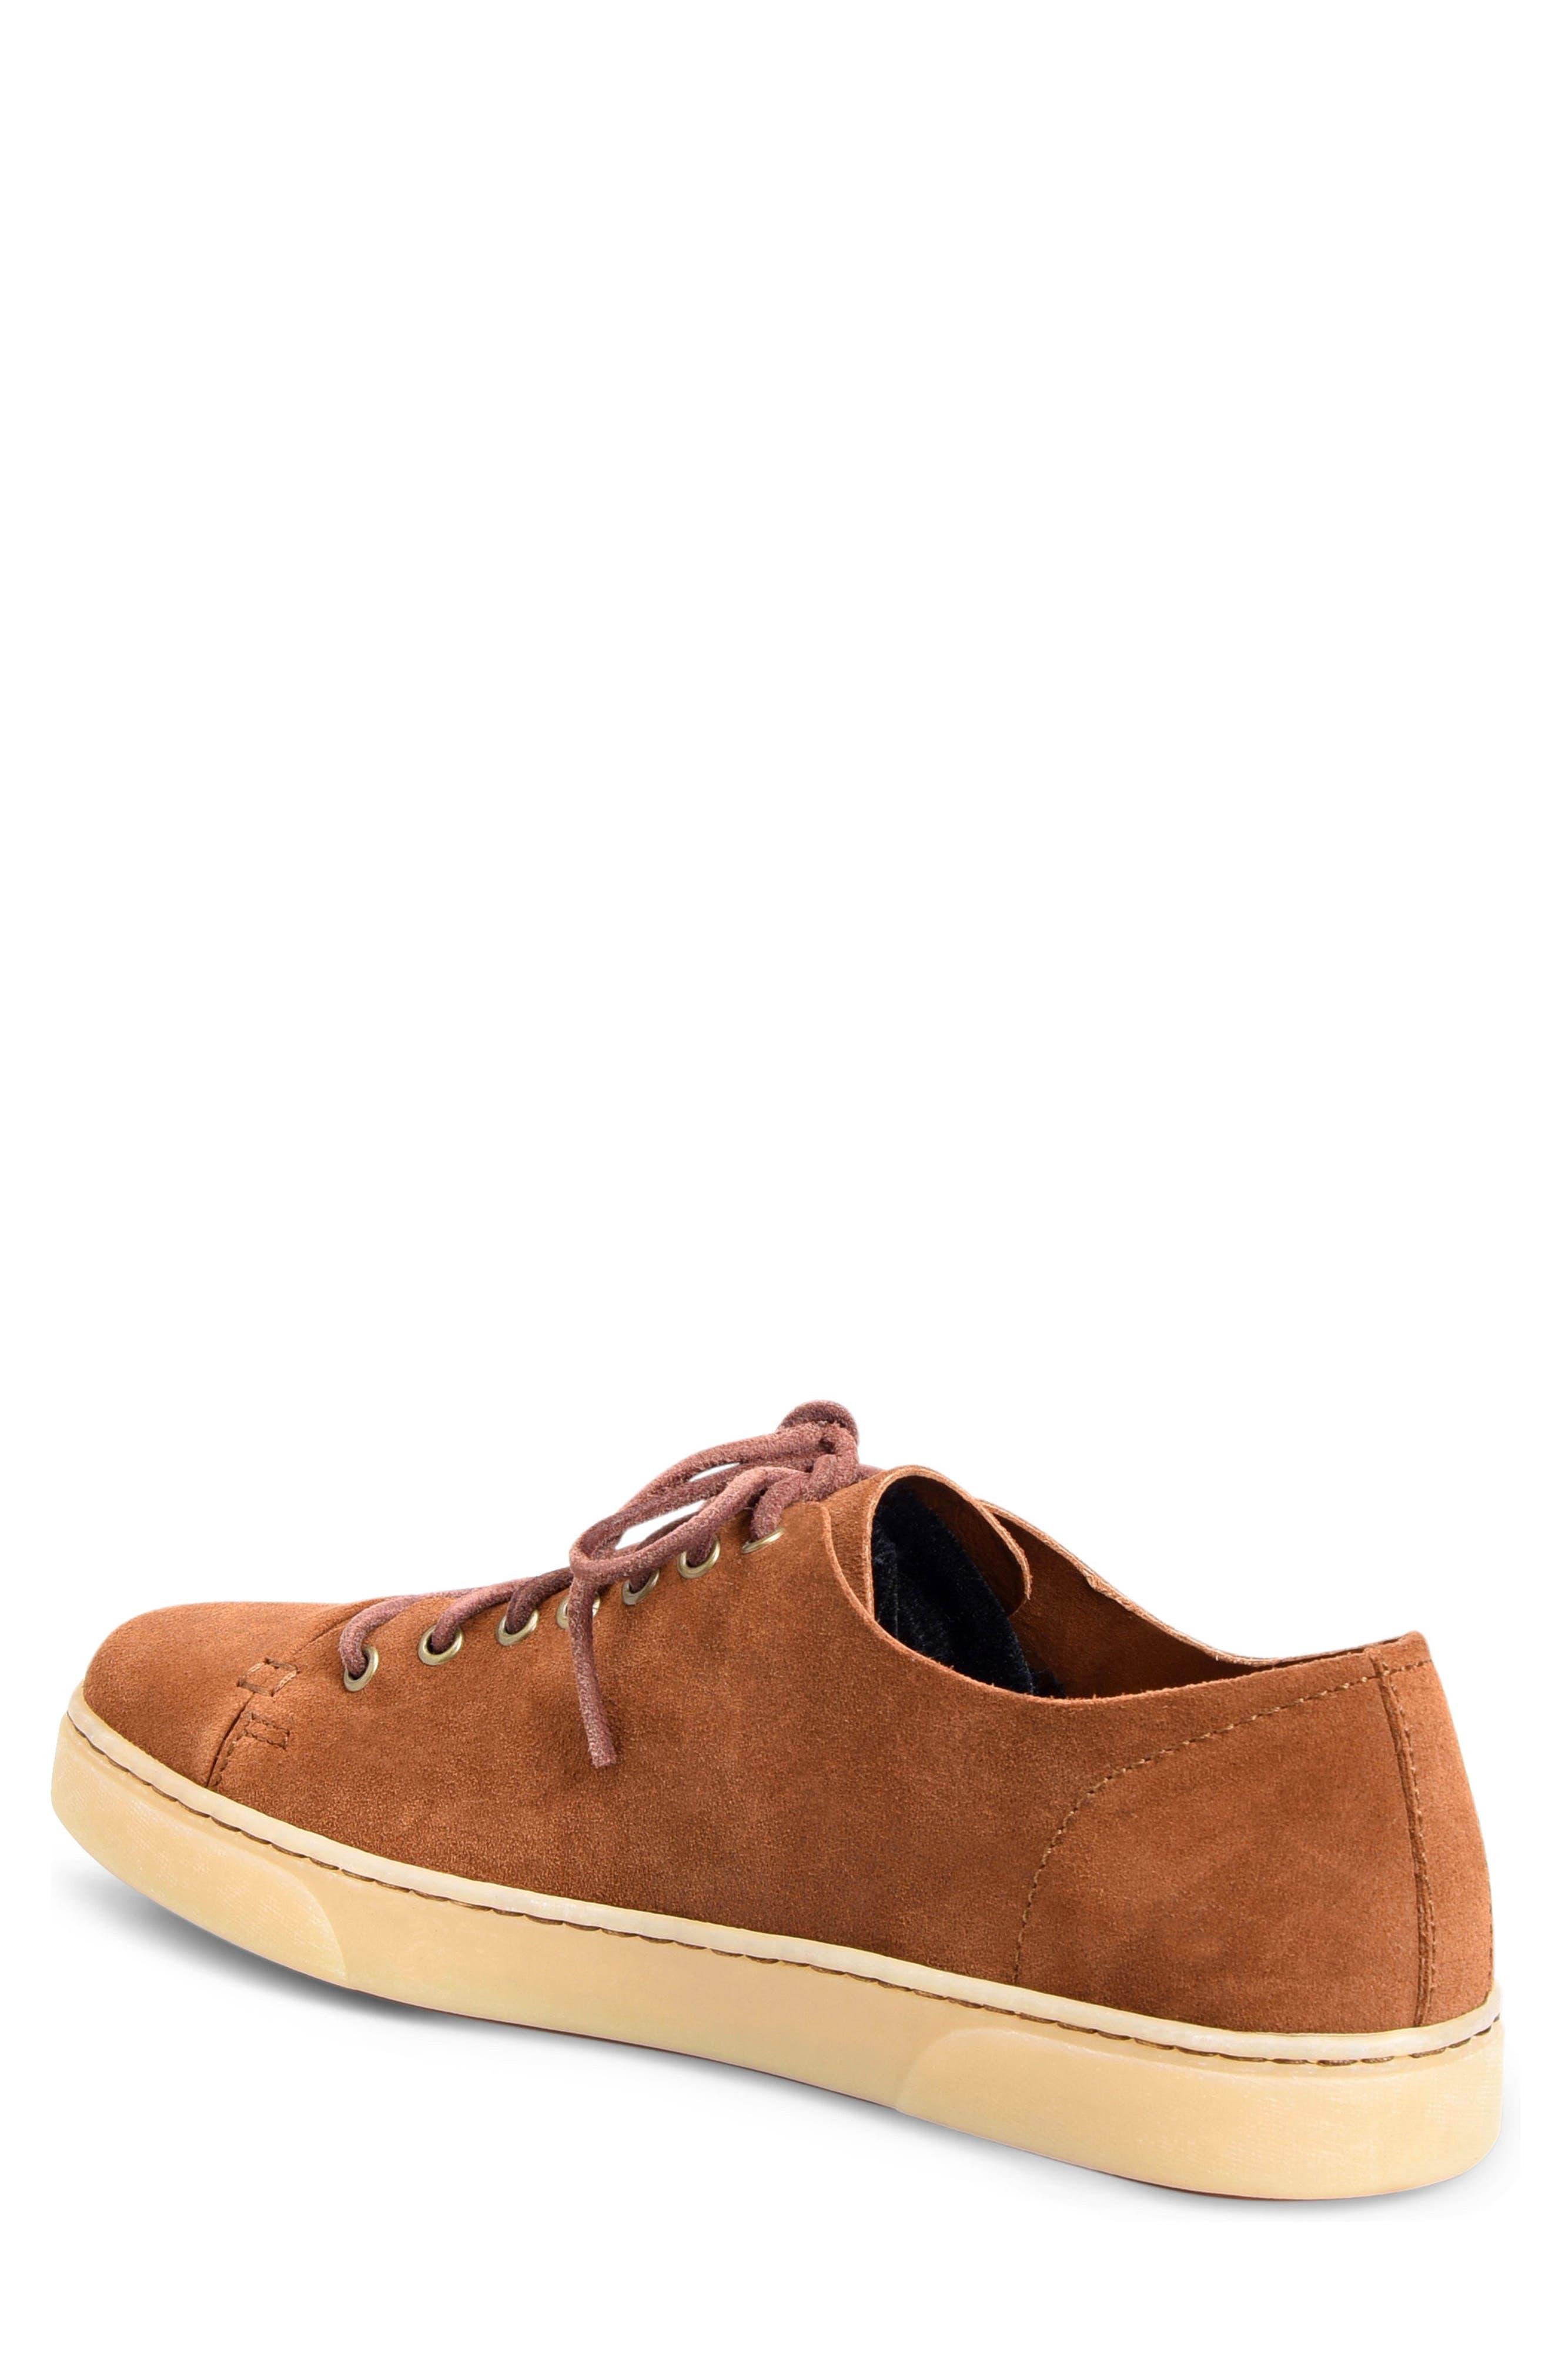 'Bayne' Cap Toe Sneaker,                             Alternate thumbnail 32, color,